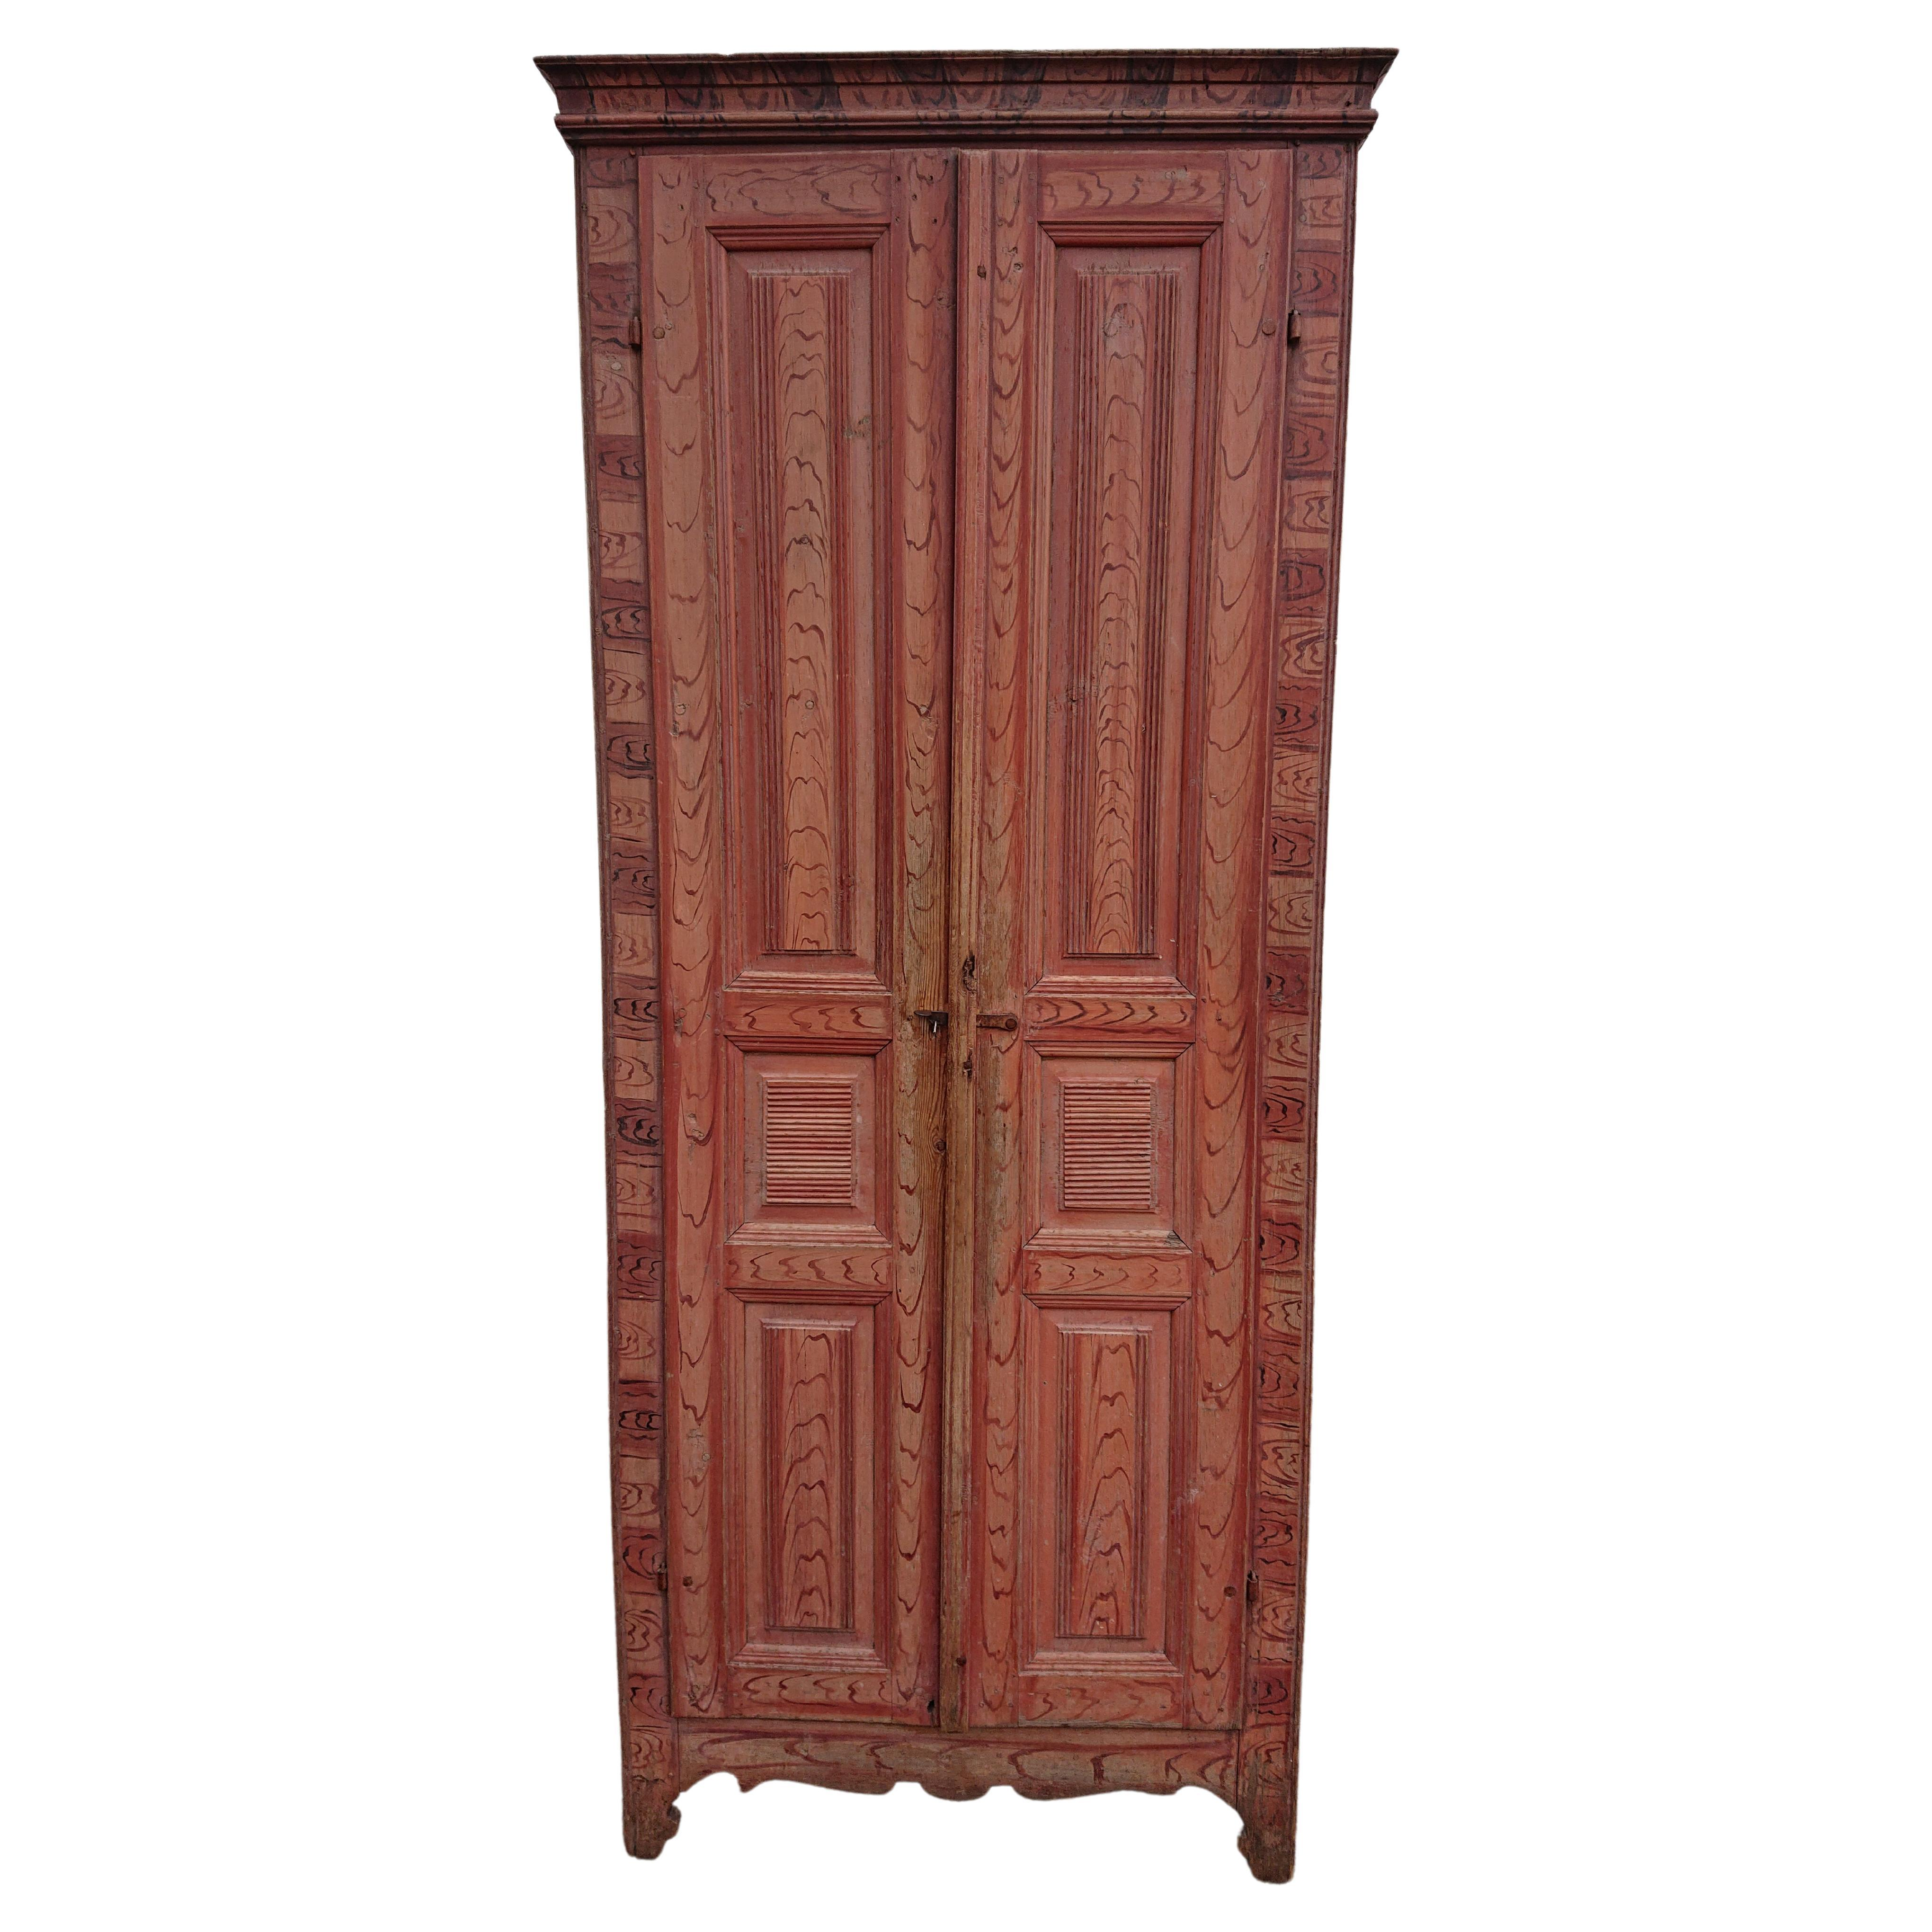 19th Century Swedish Gustavian Cabinet with Originalpaint